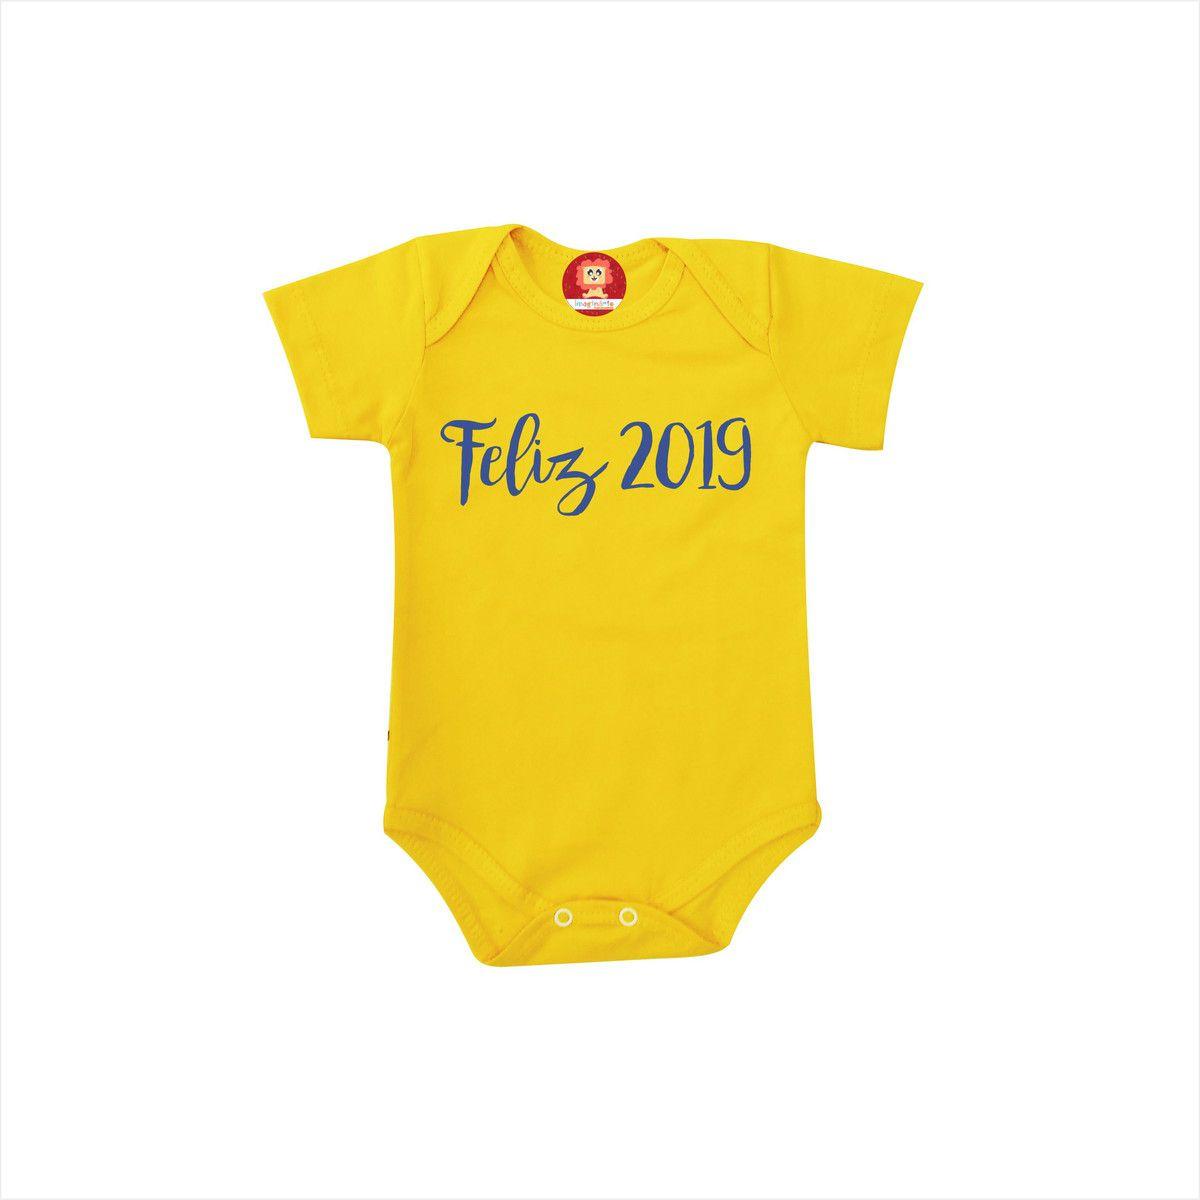 Body ou Camiseta Feliz 2019